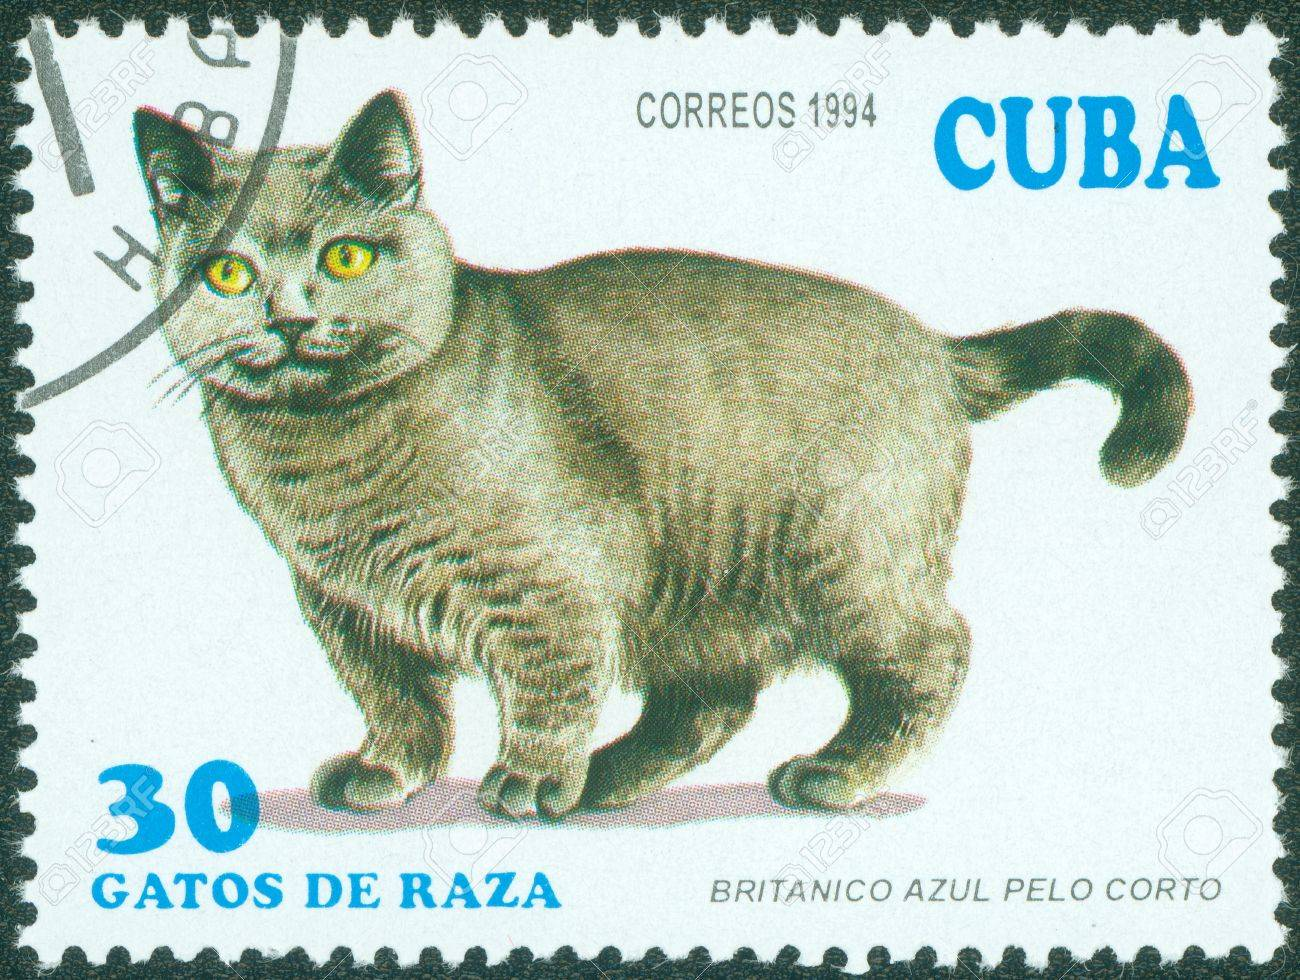 noir cubain chatte gros mature porno tubes